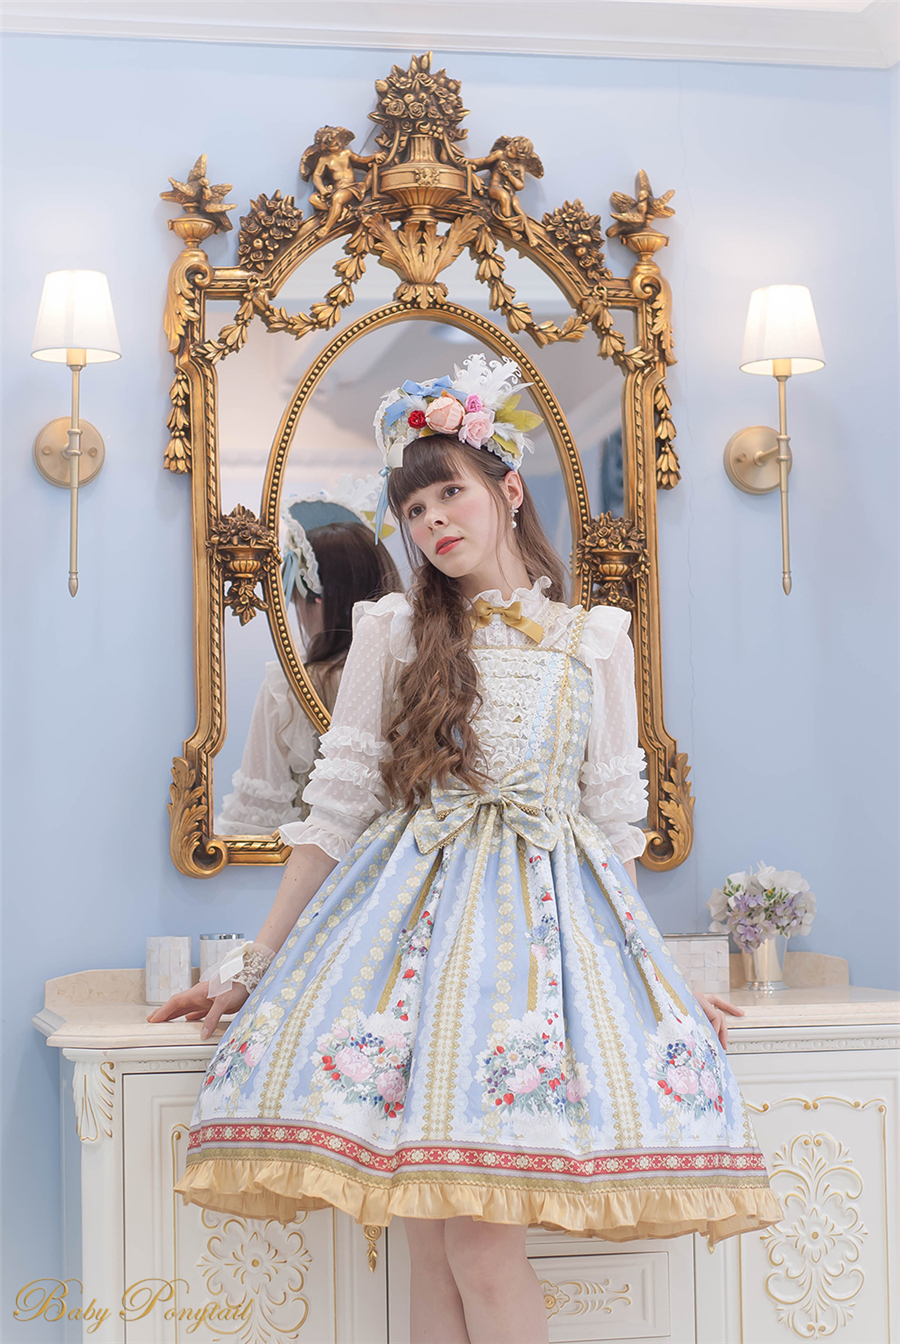 Baby Ponytail_Model Photo_Polly's Garden of Dreams_JSK Blue_Claudia_12.jpg